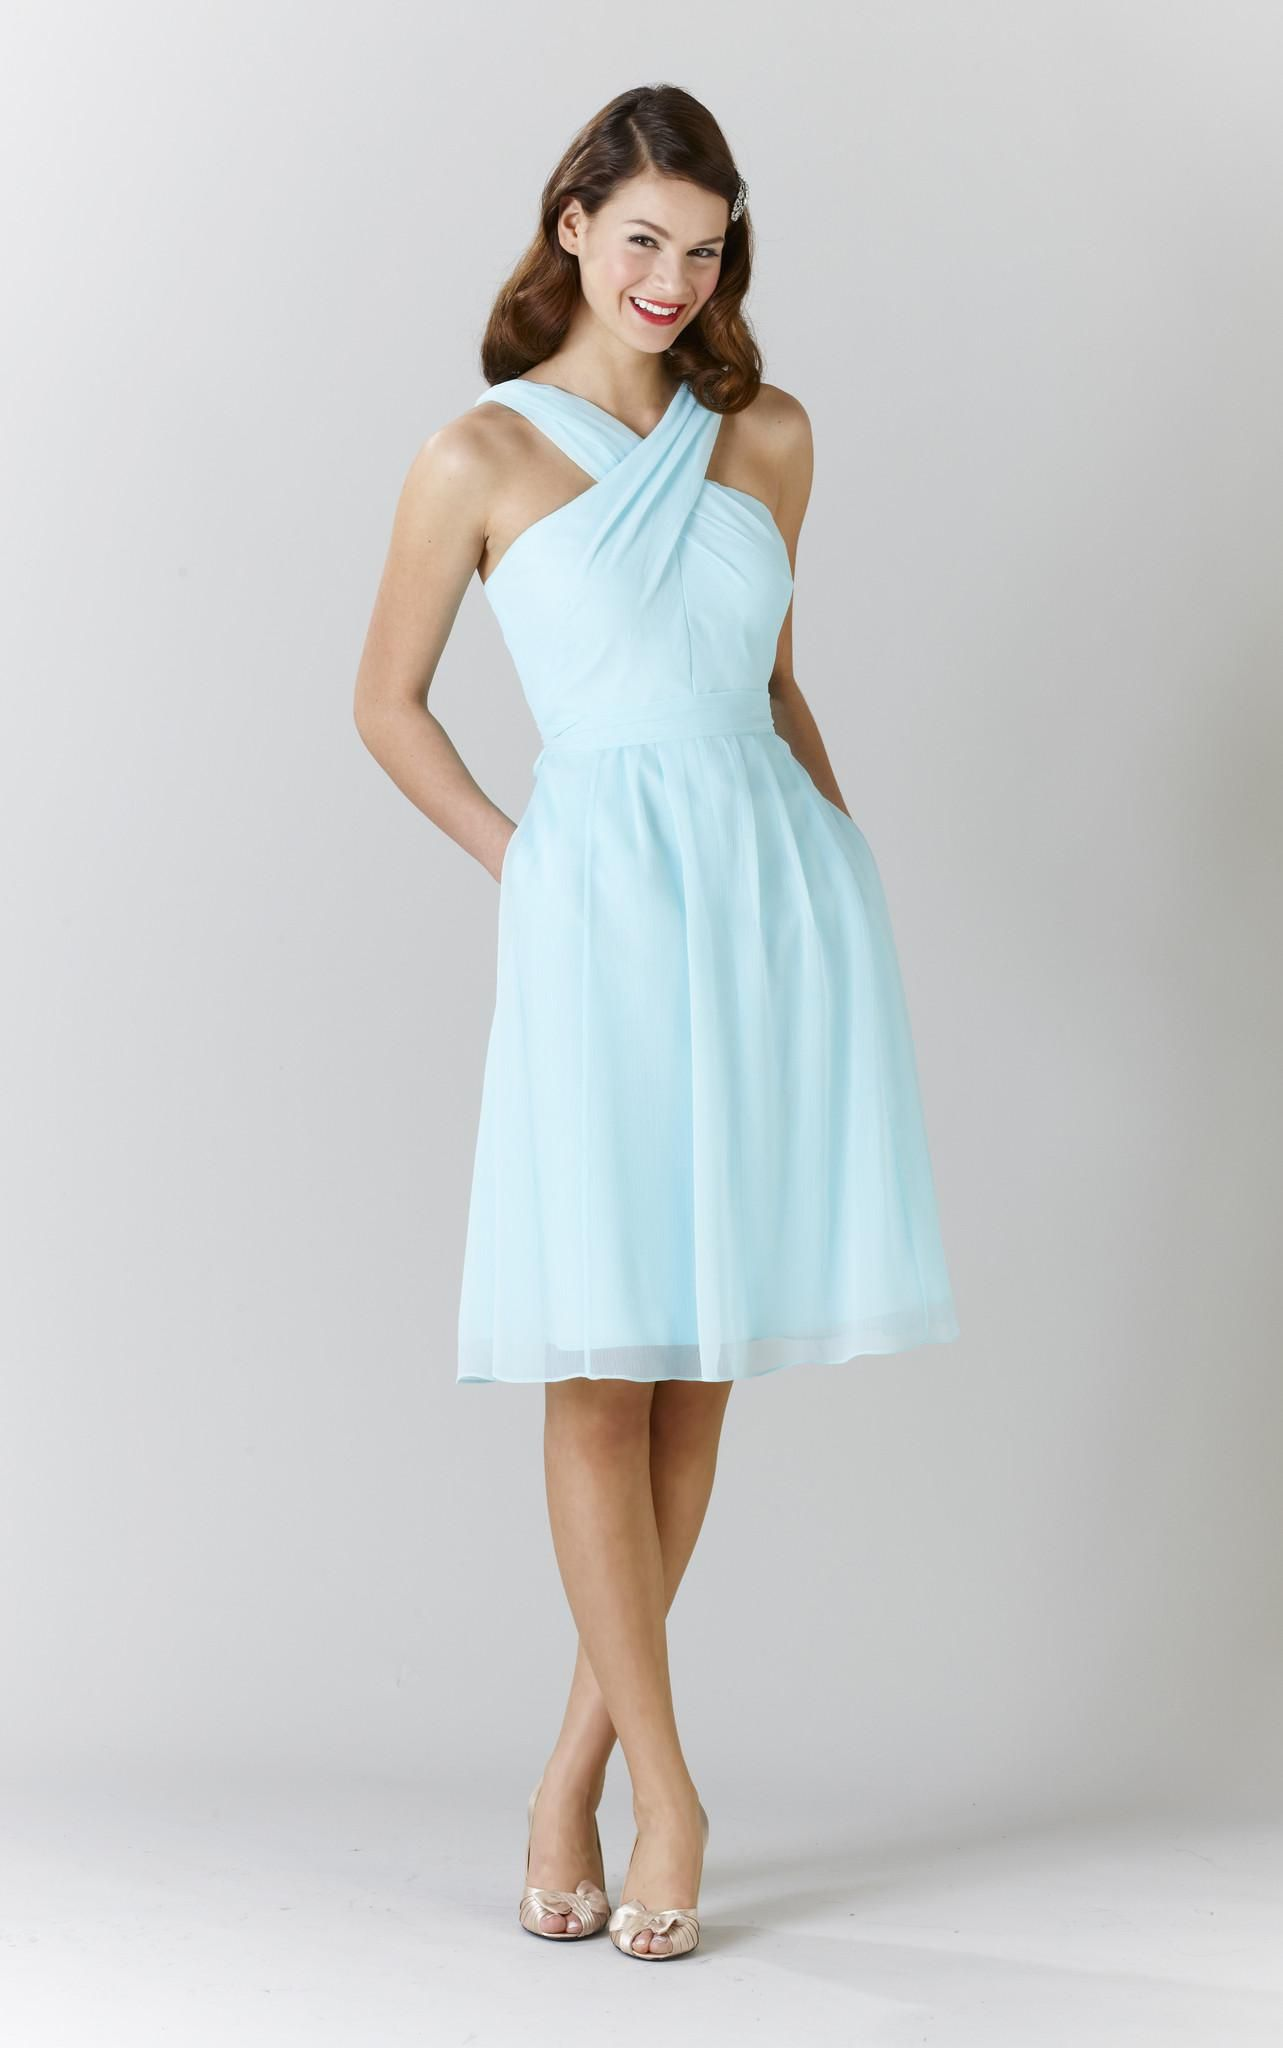 Pin by lynita on fashion u beauty pinterest bridesmaid dresses